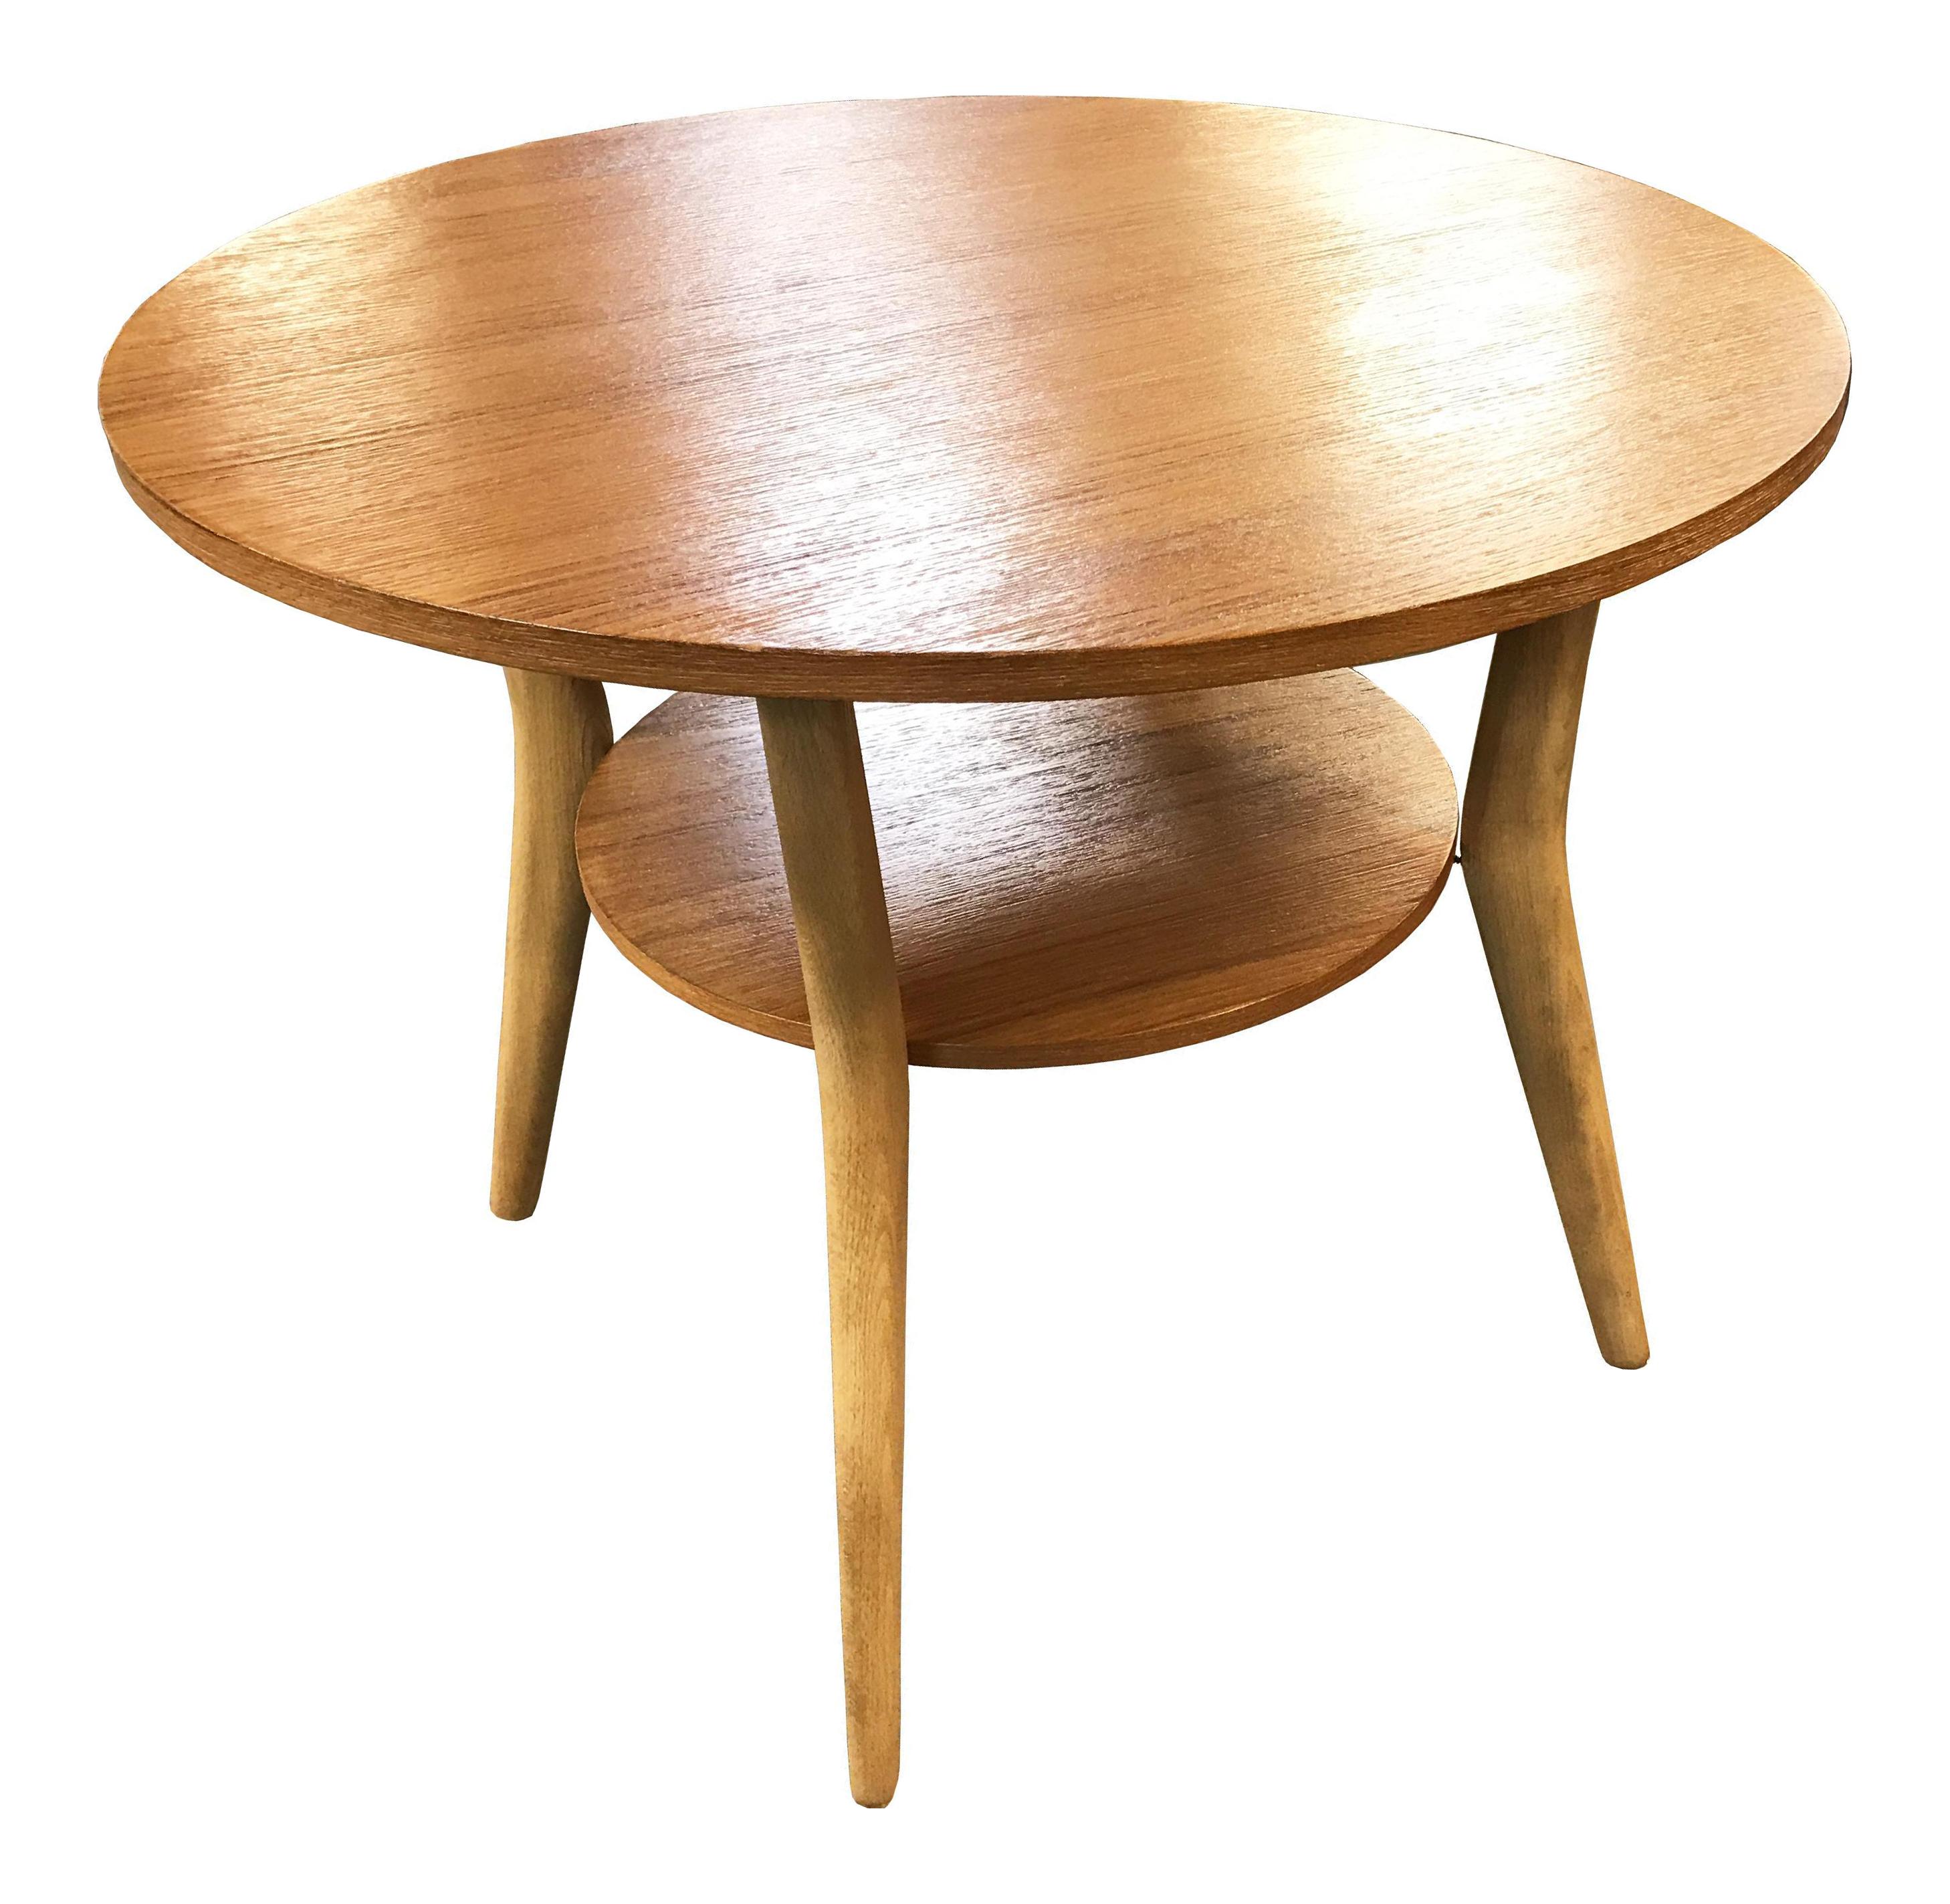 Vintage Mid-Century Danish Round Coffee Table Chairish